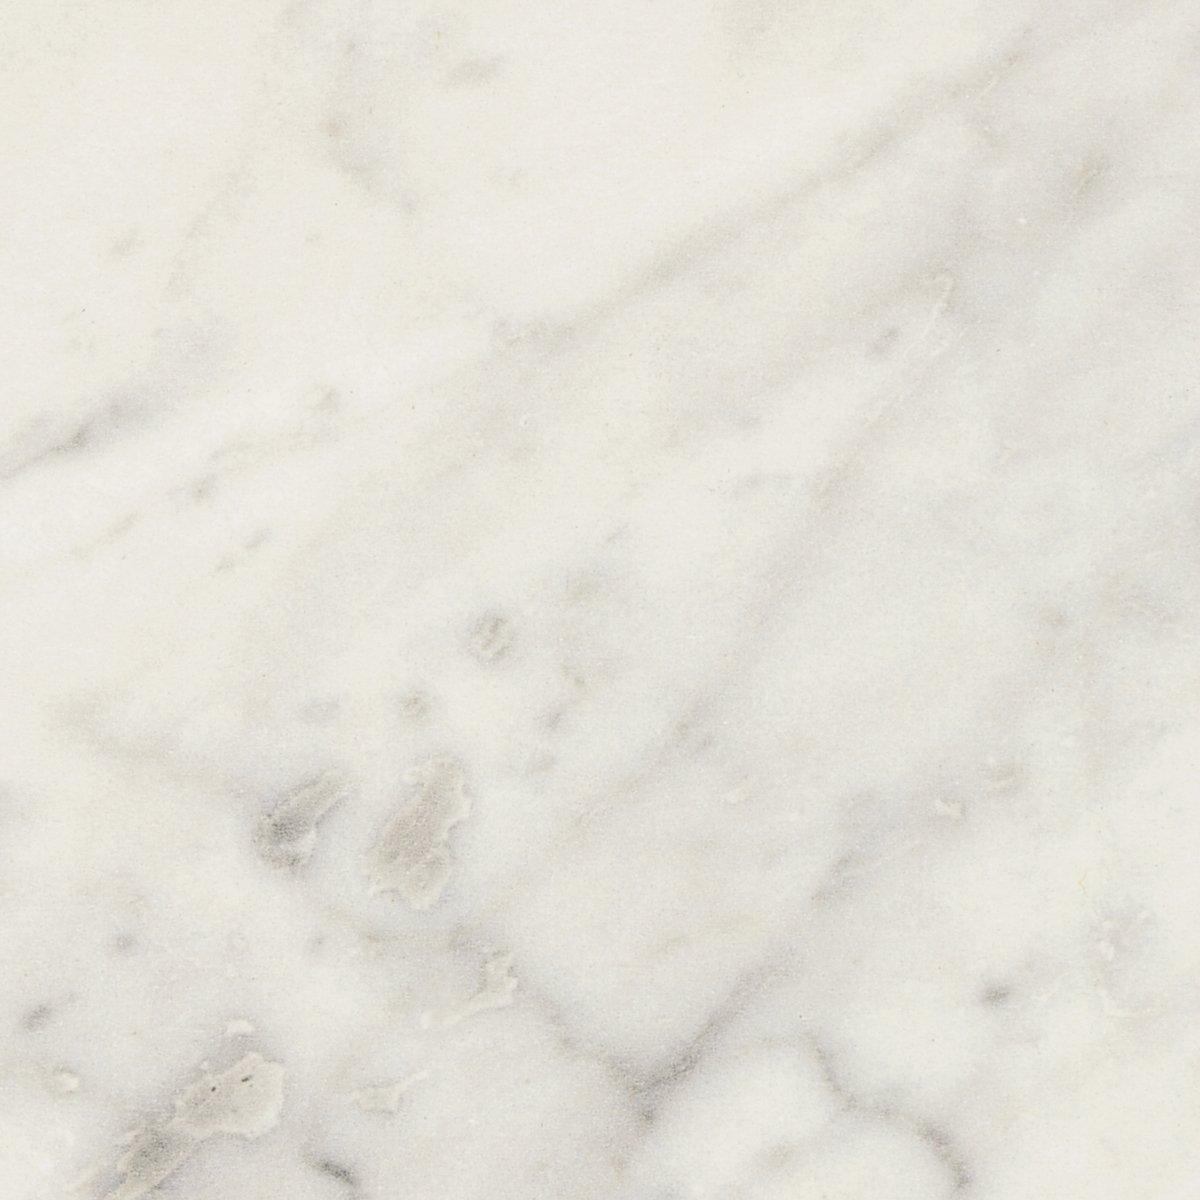 Formica Brand Laminate 066961246512000 Carrara Bianco Laminate, Carrara Bianco Etchings